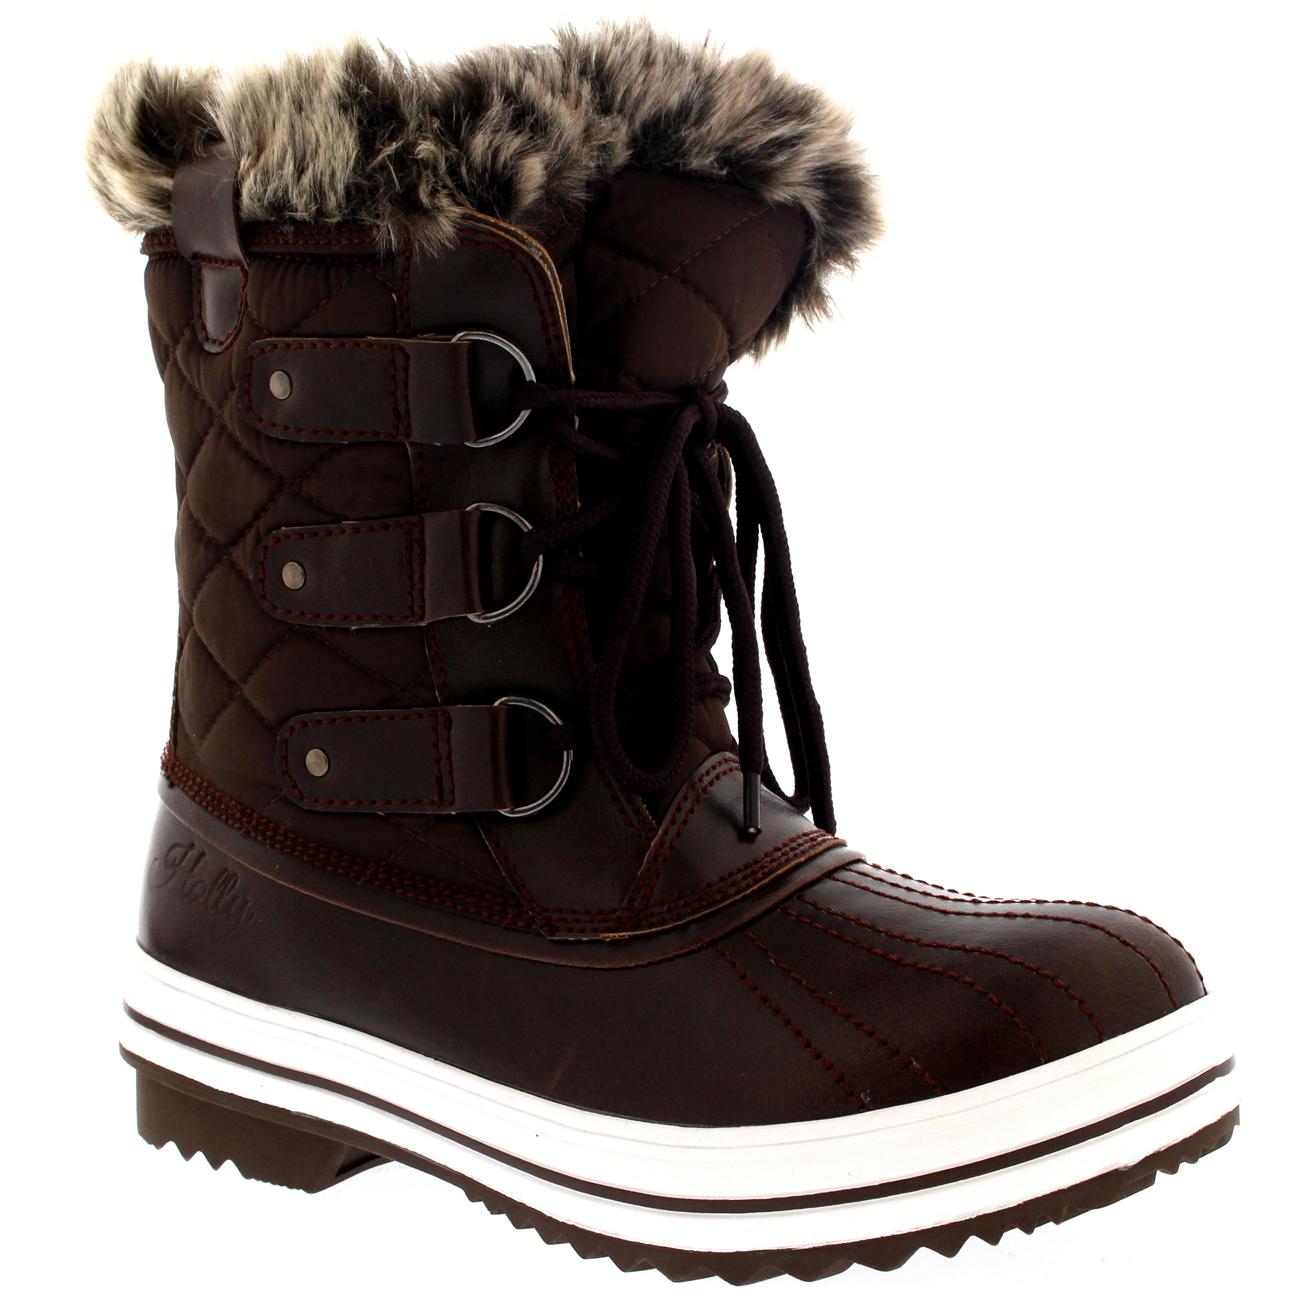 Womens-Snow-Boot-Nylon-Short-Winter-Snow-Fur-